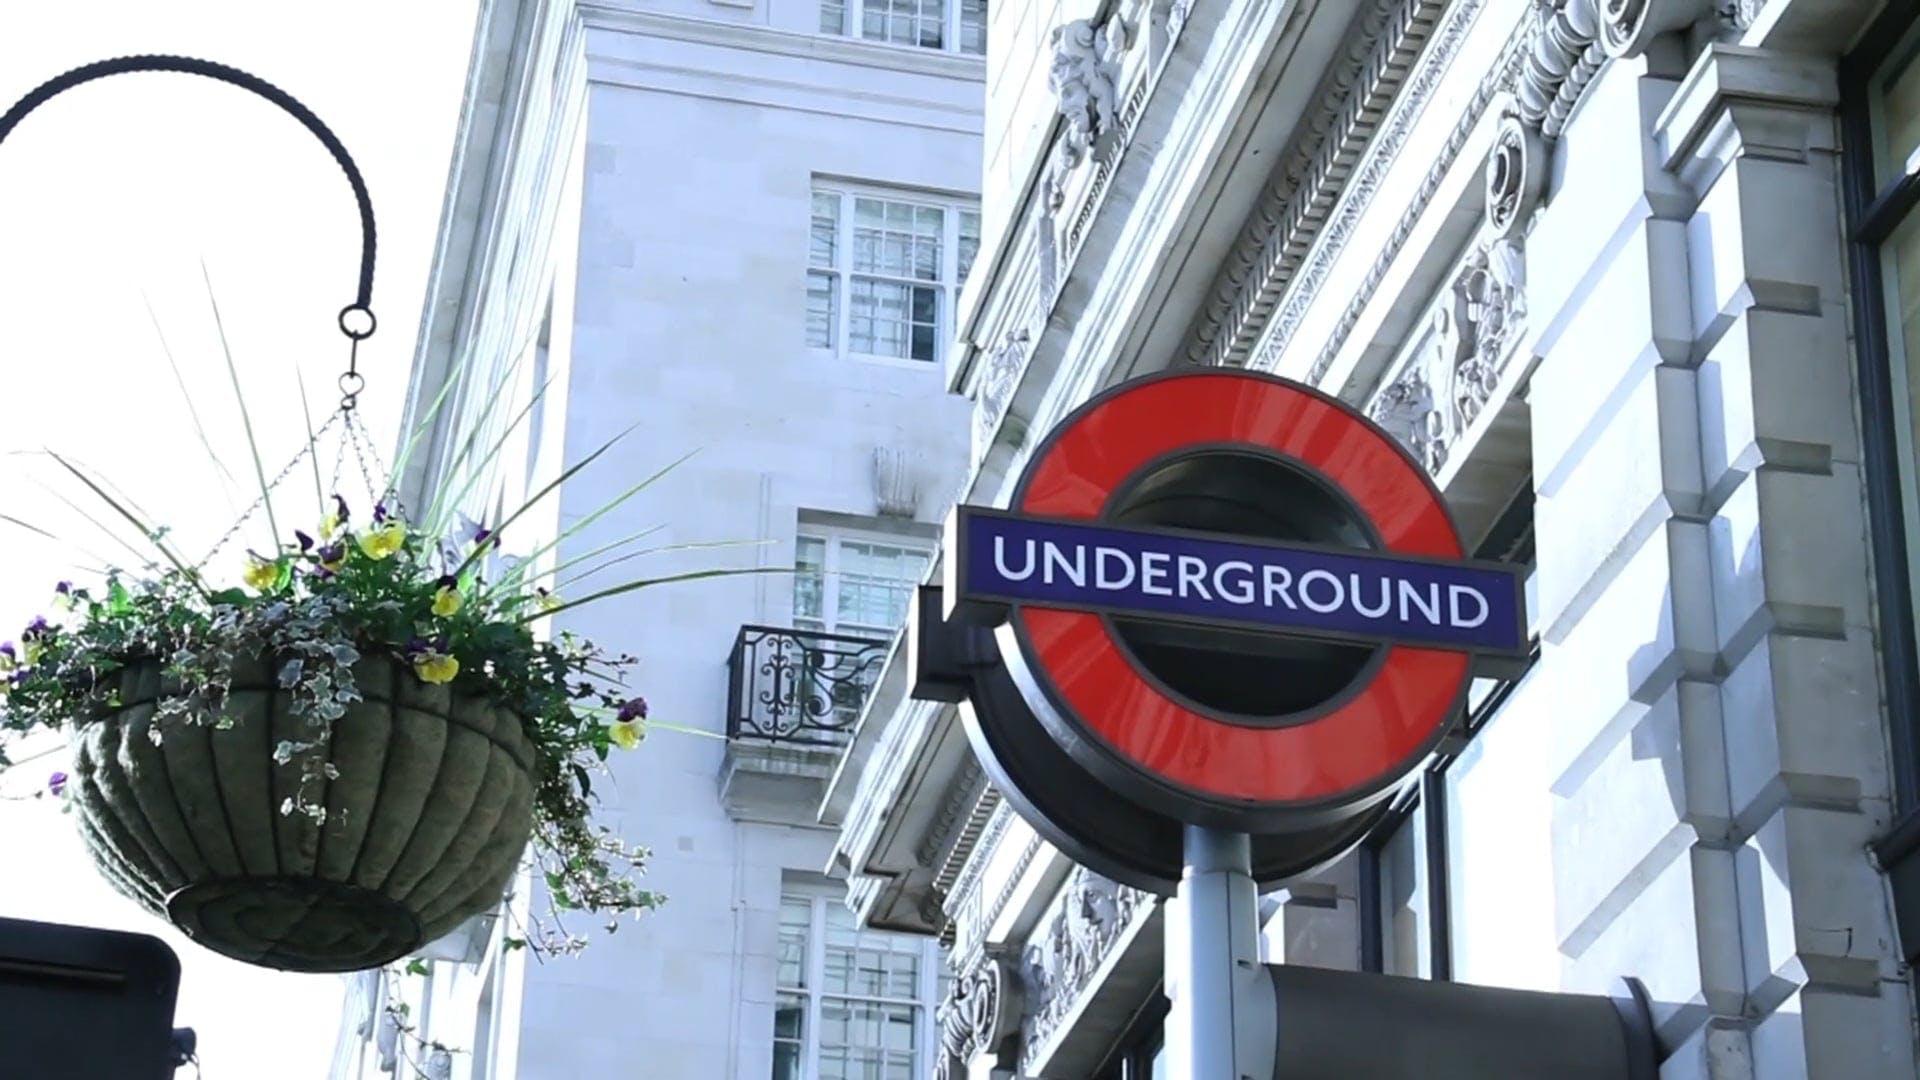 Close-Up View Of Underground Signage